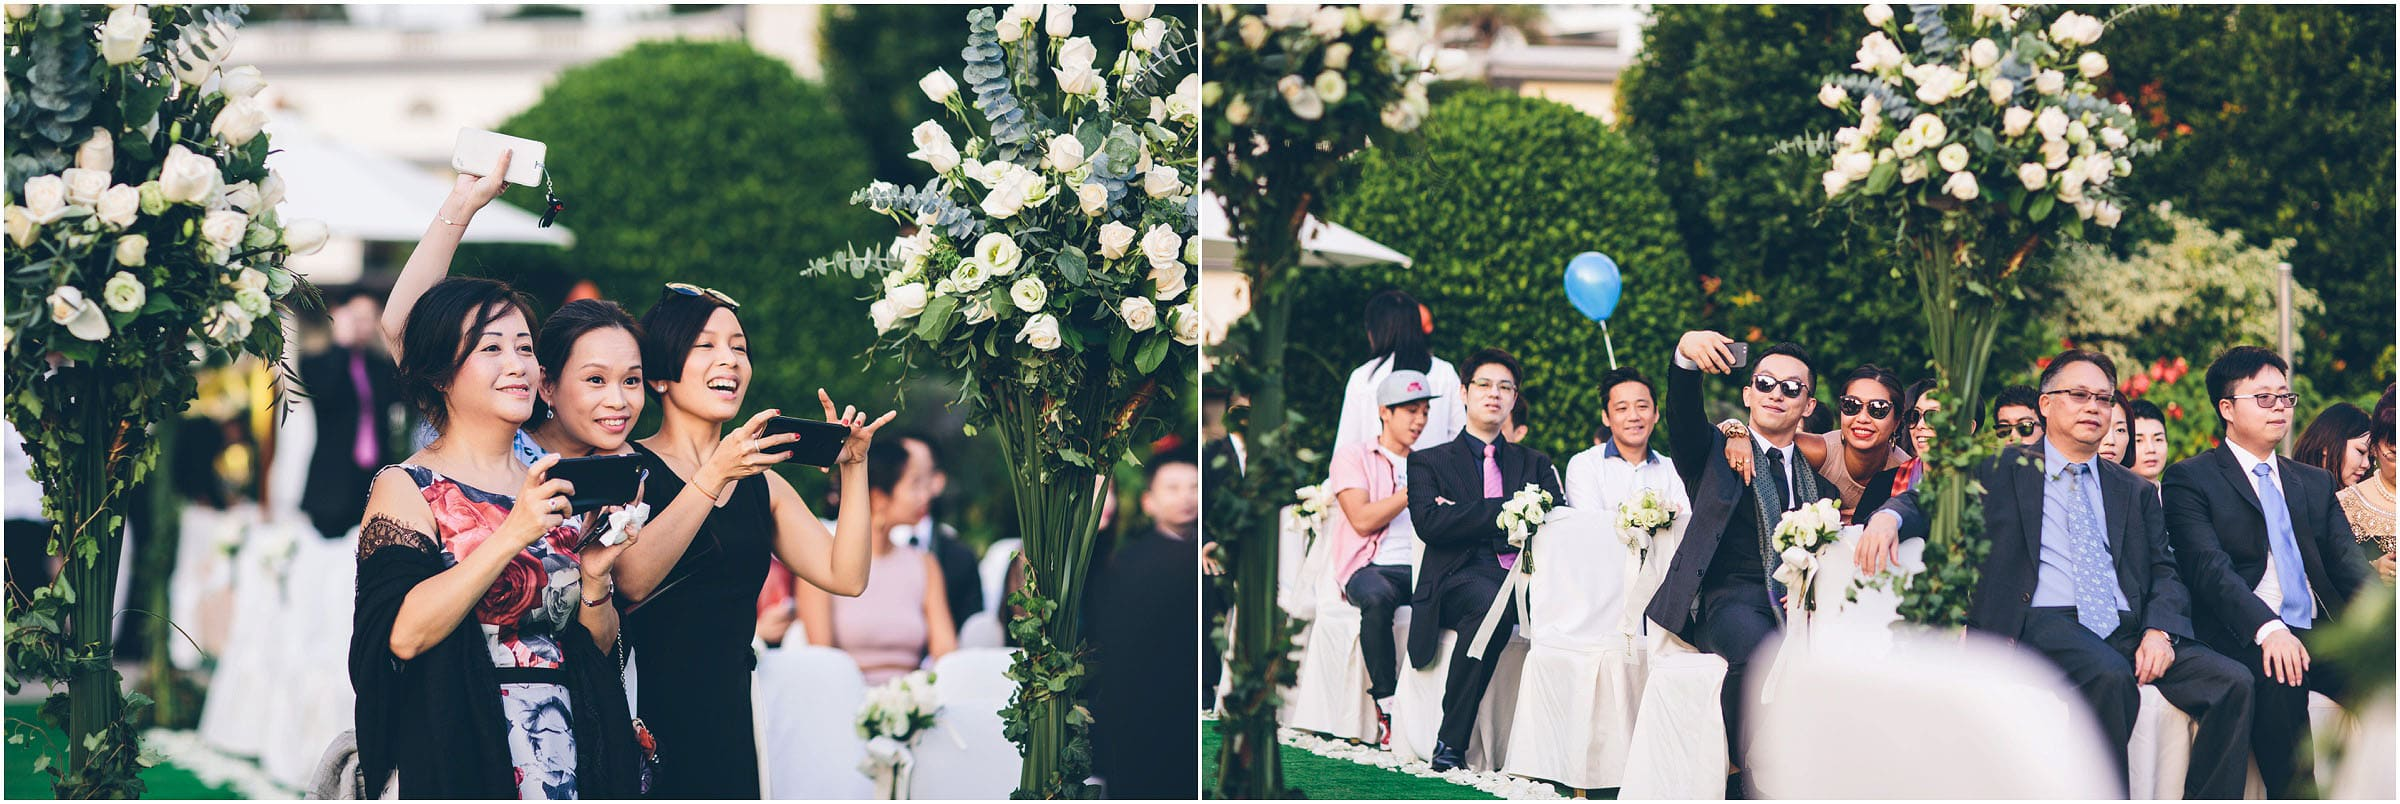 Hong_Kong_Destination_Wedding_Photography_0045